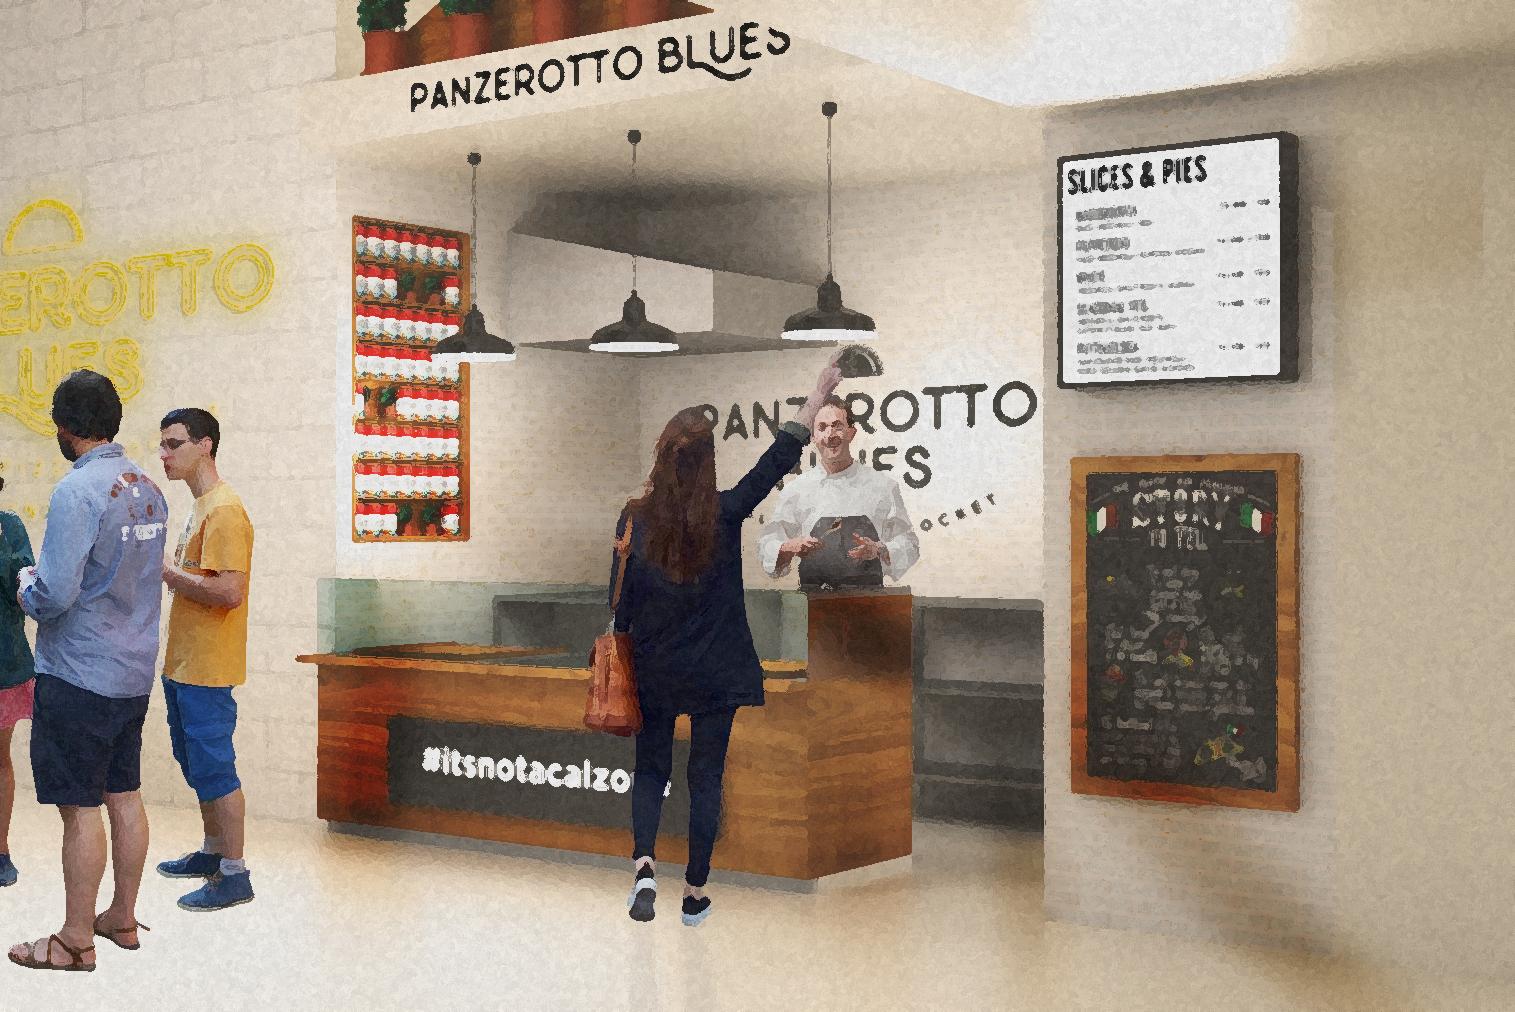 PANZEROTTO BLUES STORE